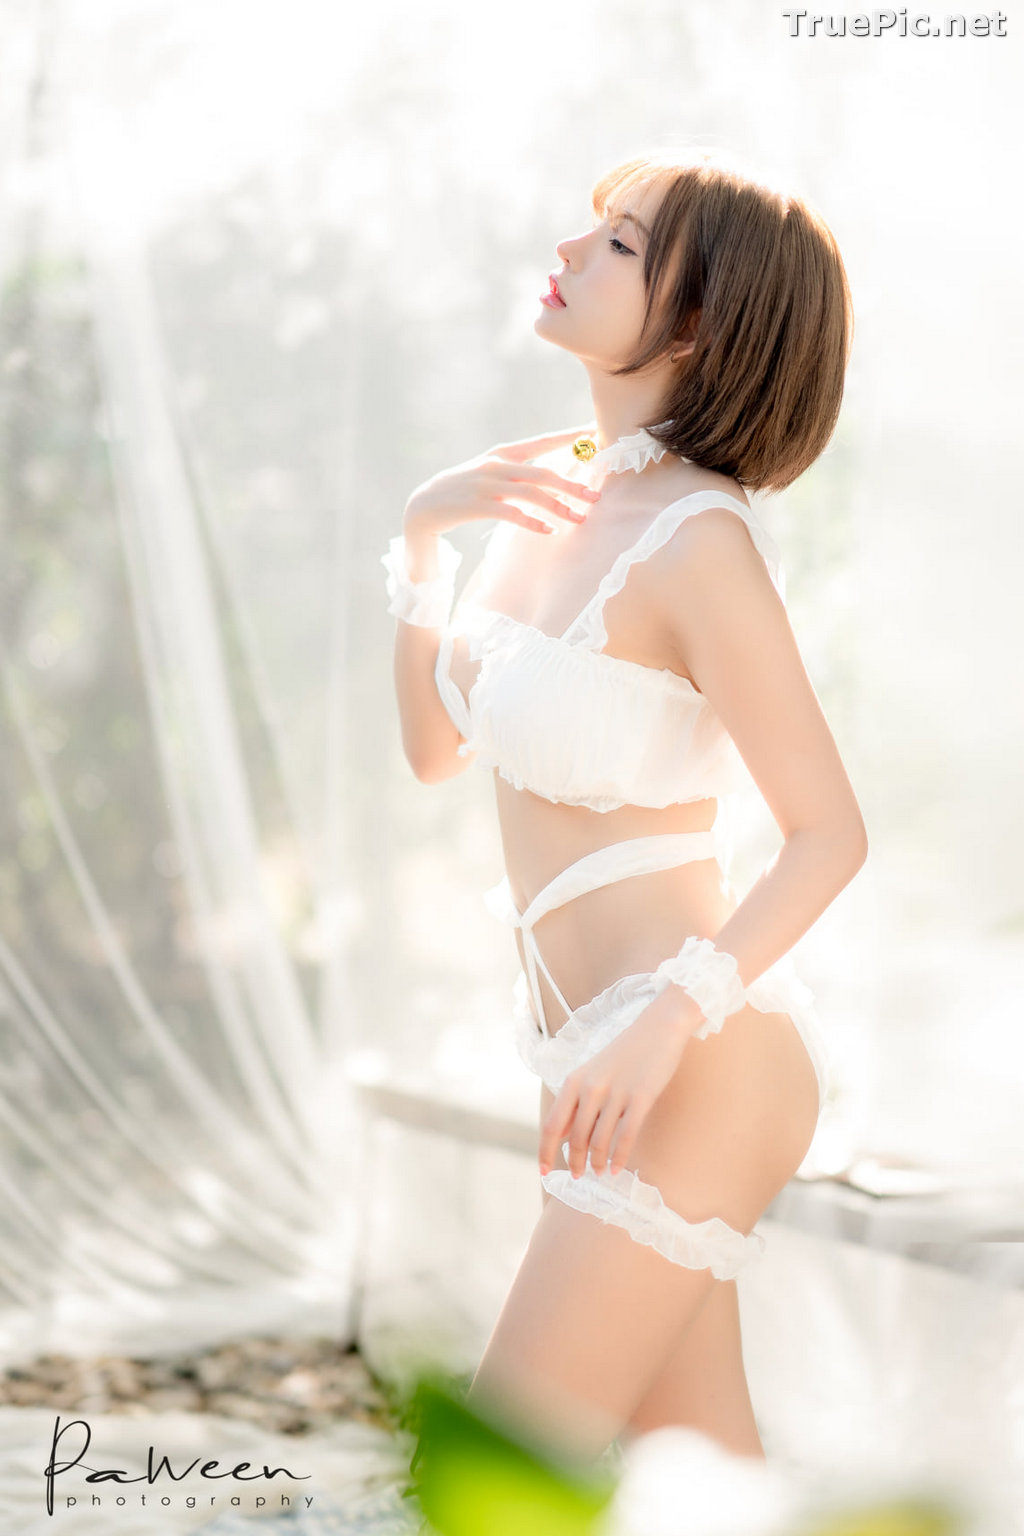 Image Thailand Model - Sutasinee Nokia Sirirak - White Sexy Bikini - TruePic.net - Picture-2